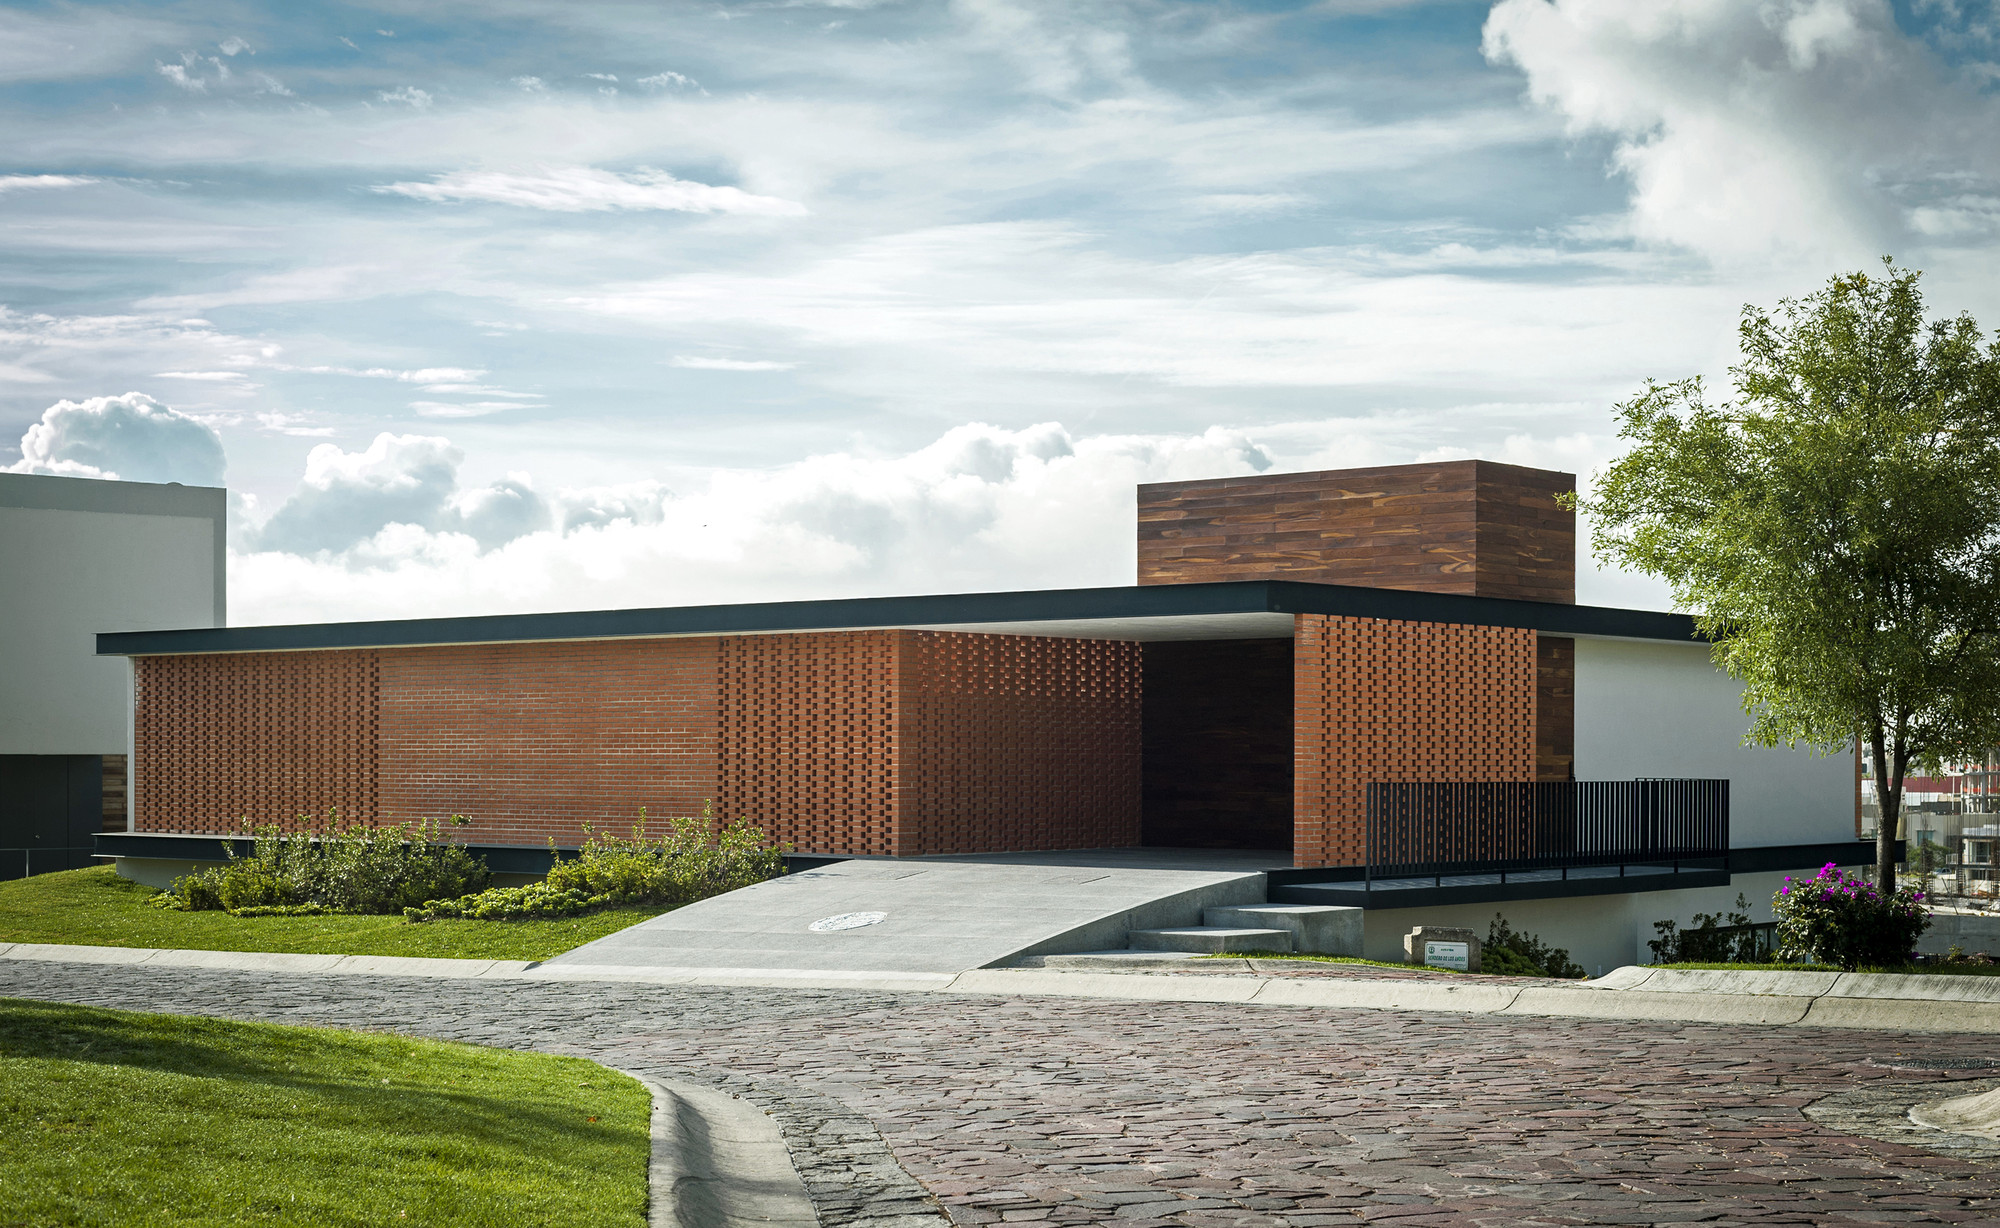 Galeria de casa ro alexanderson arquitectos 8 for Casa de arquitectos